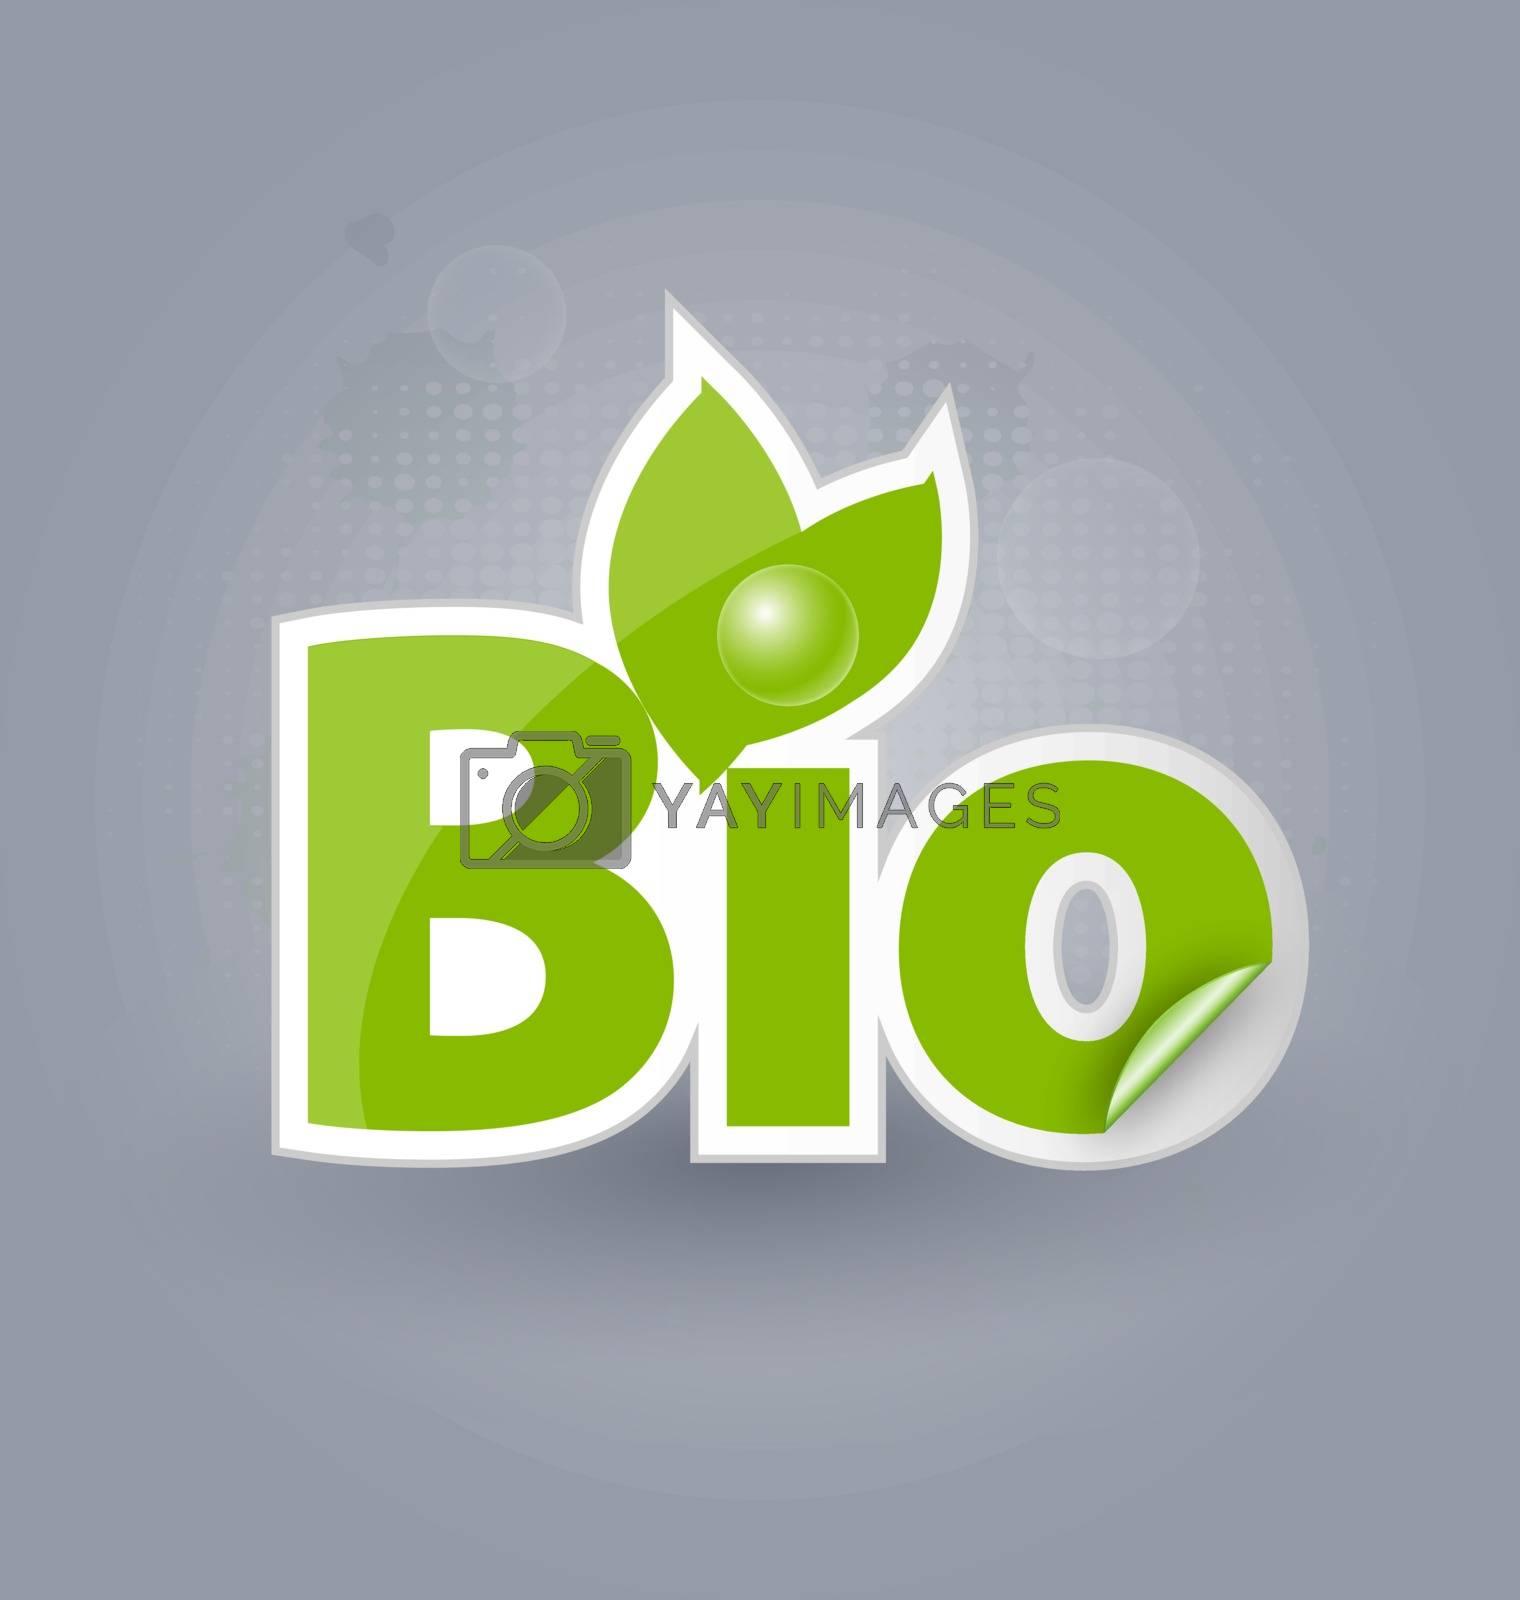 Bio background with selfadhesive bio sticker for creative design